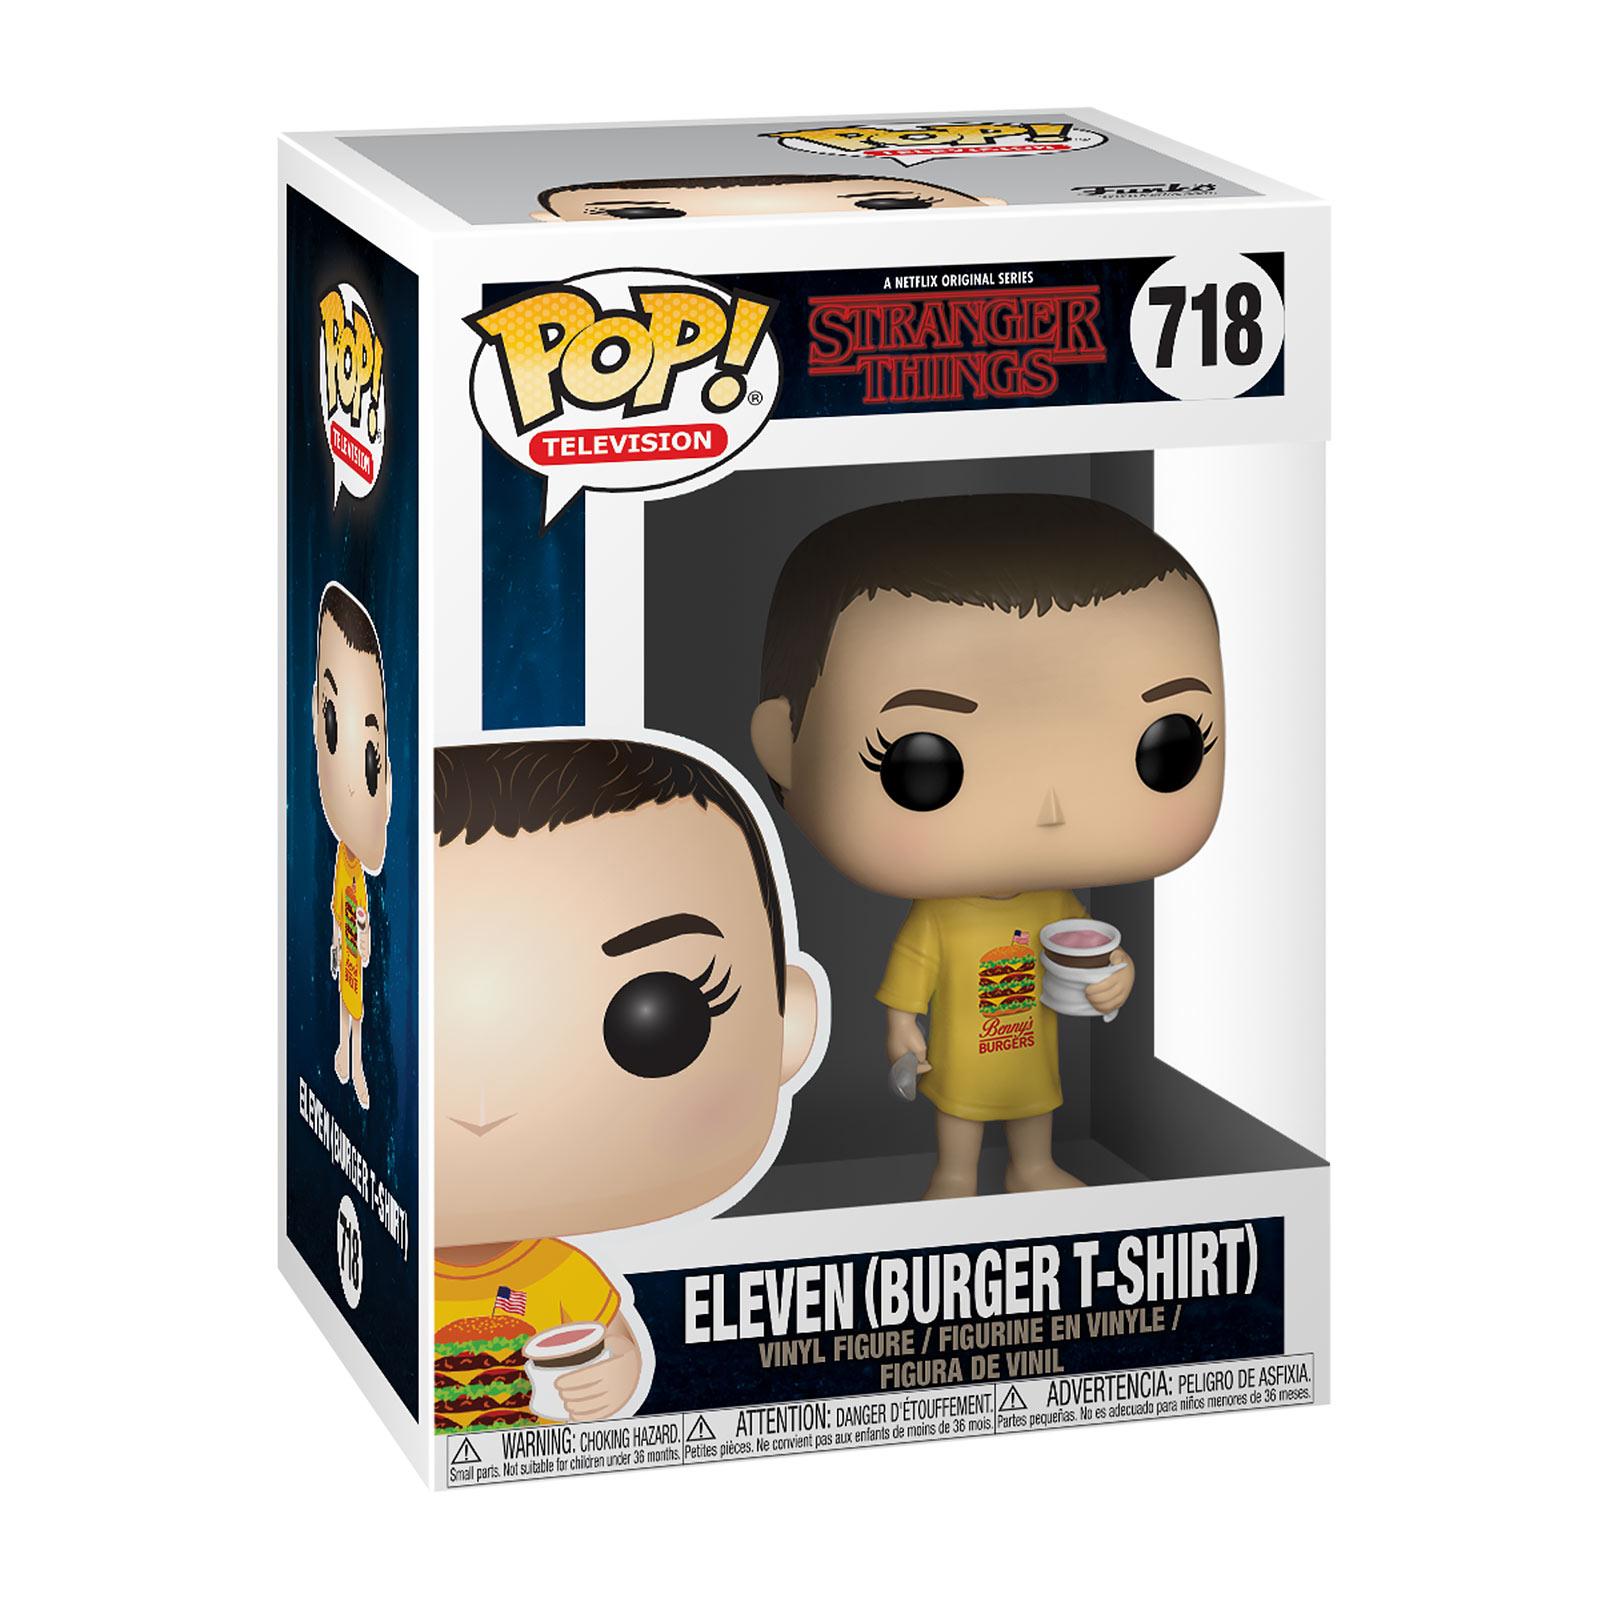 Stranger Things - Eleven mit Burger T-Shirt Funko Pop Figur